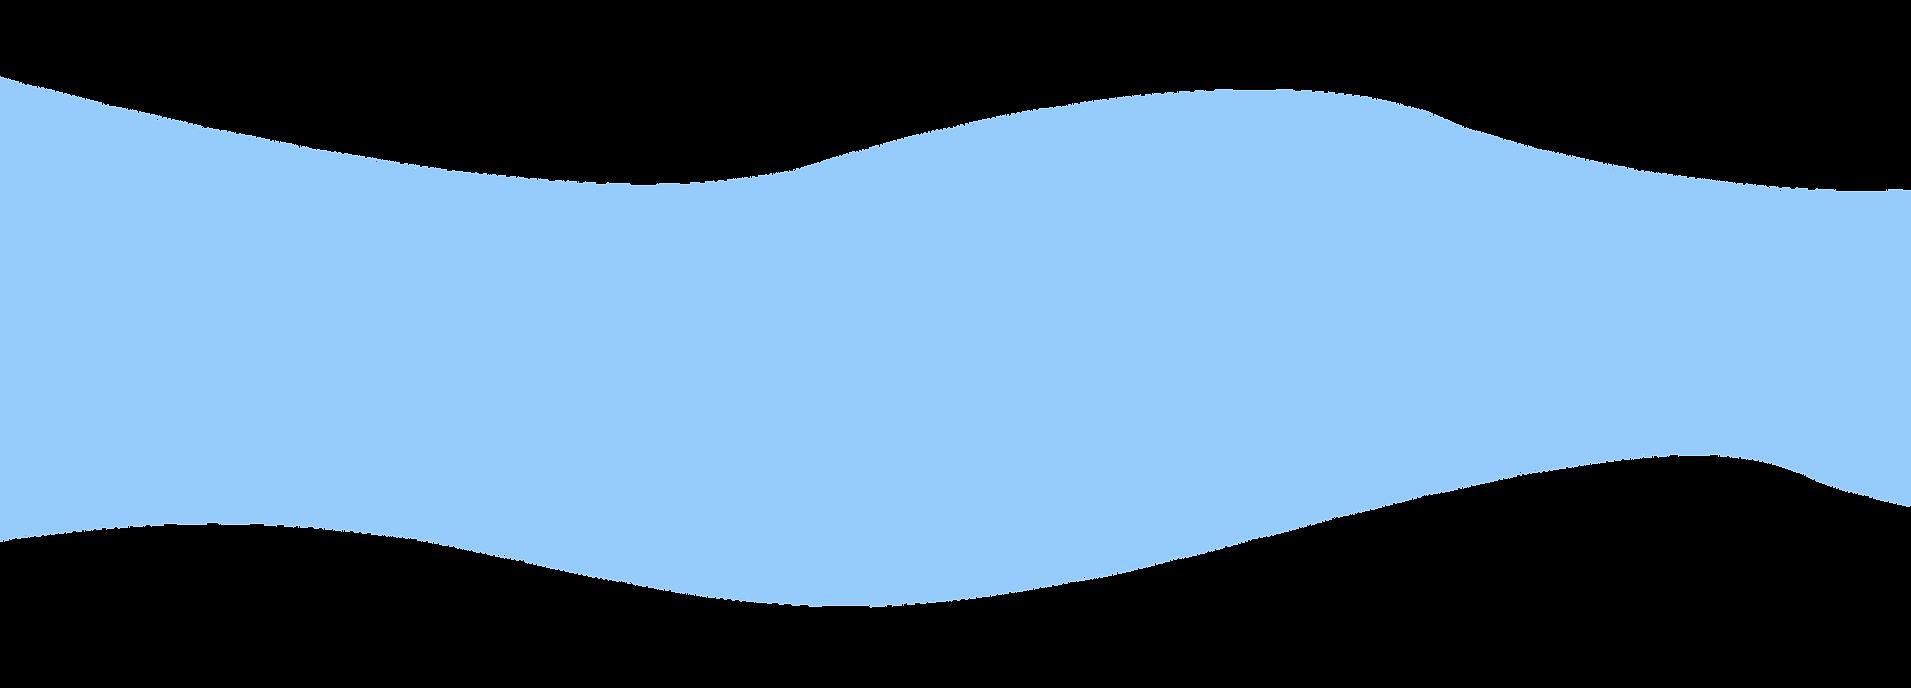 Bluewave 1.png